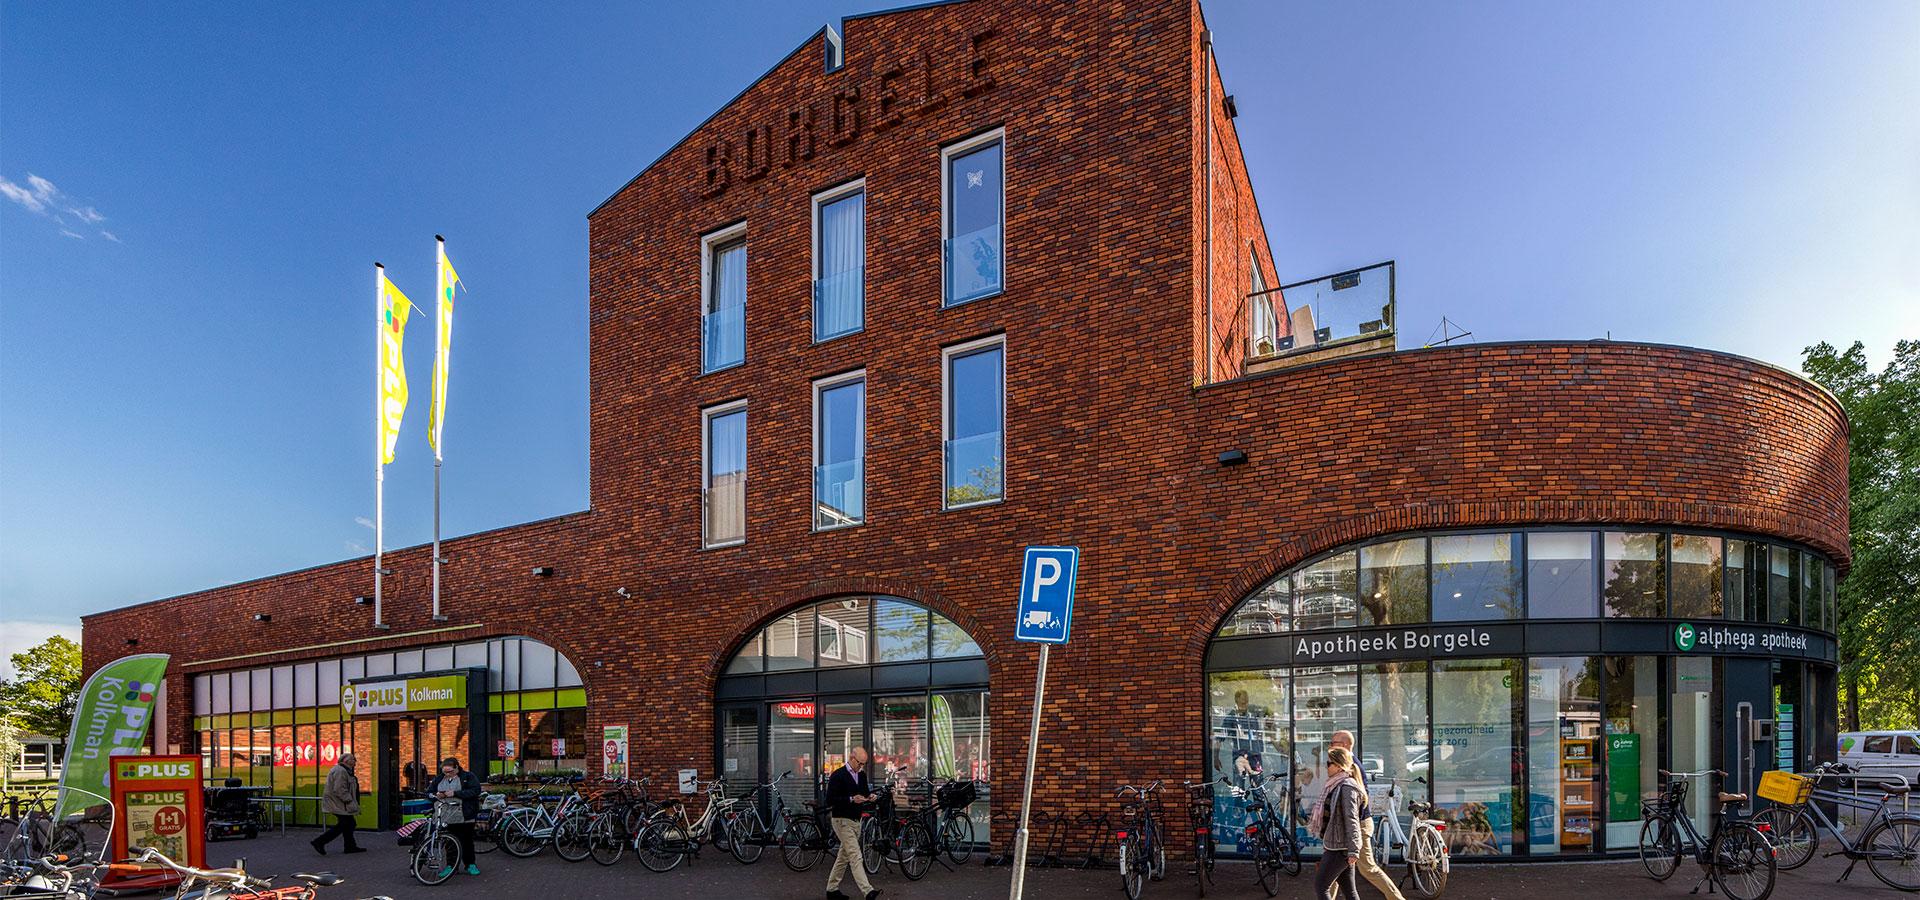 FARO architecten Borgele, Deventer 03